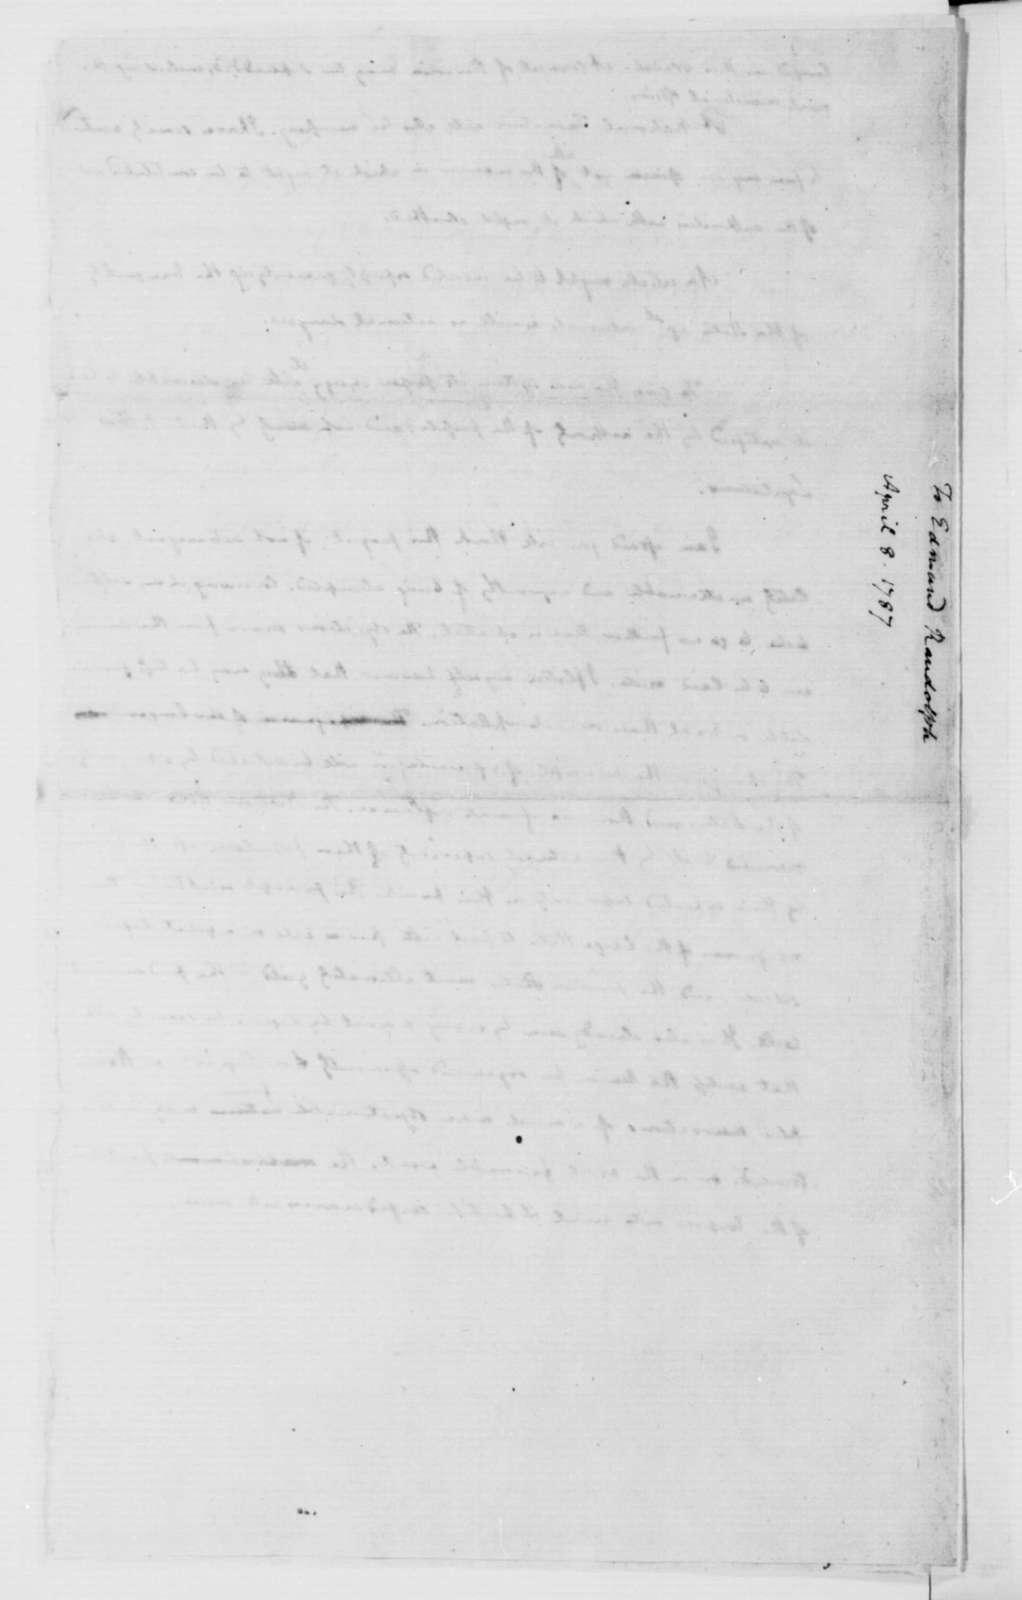 James Madison to Edmund Randolph, April 8, 1787.